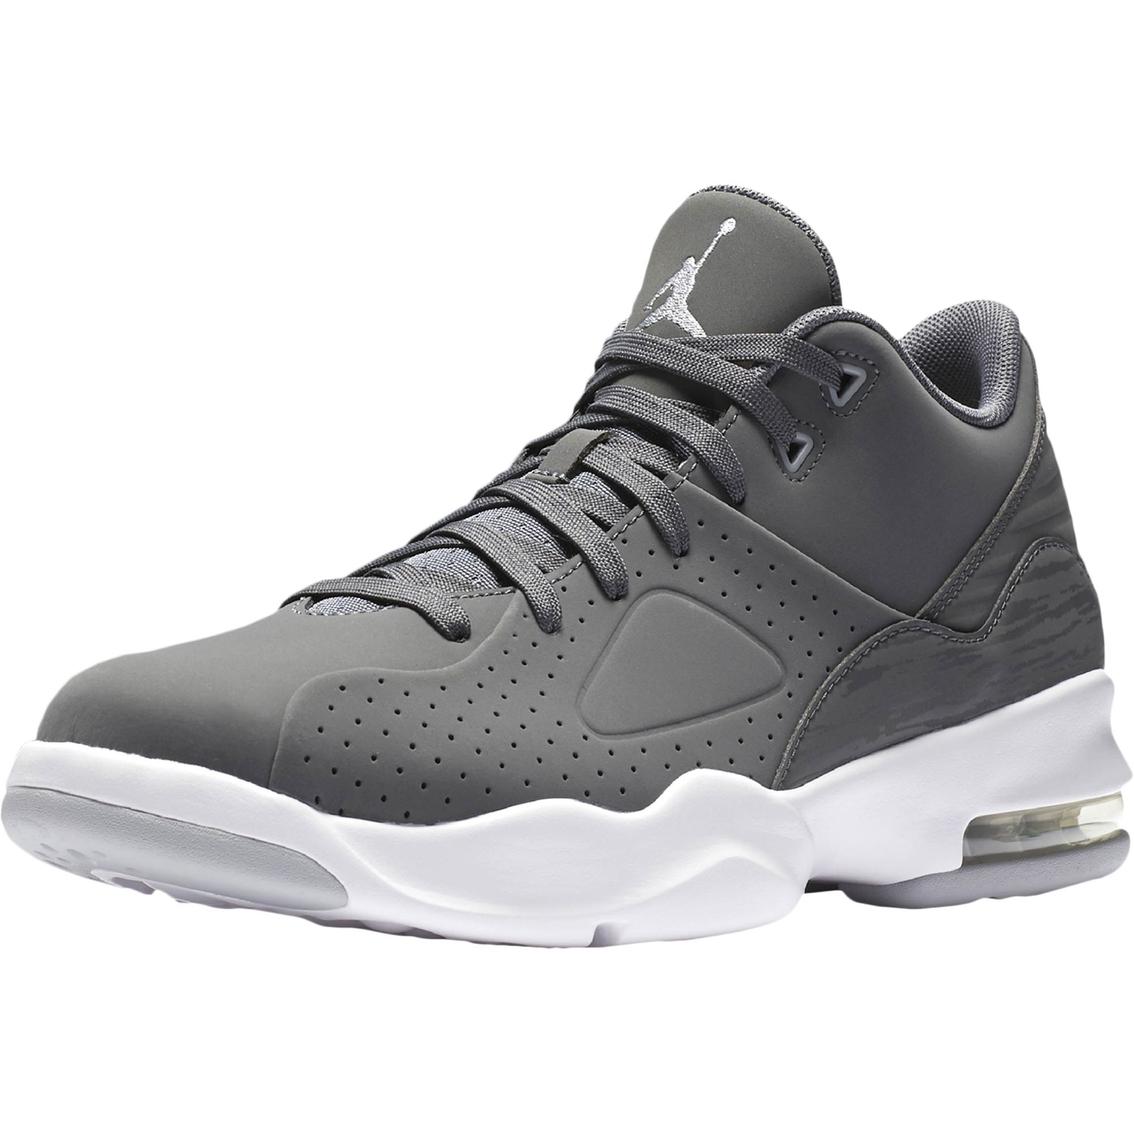 Jordan Men's Air Franchise Basketball Shoes